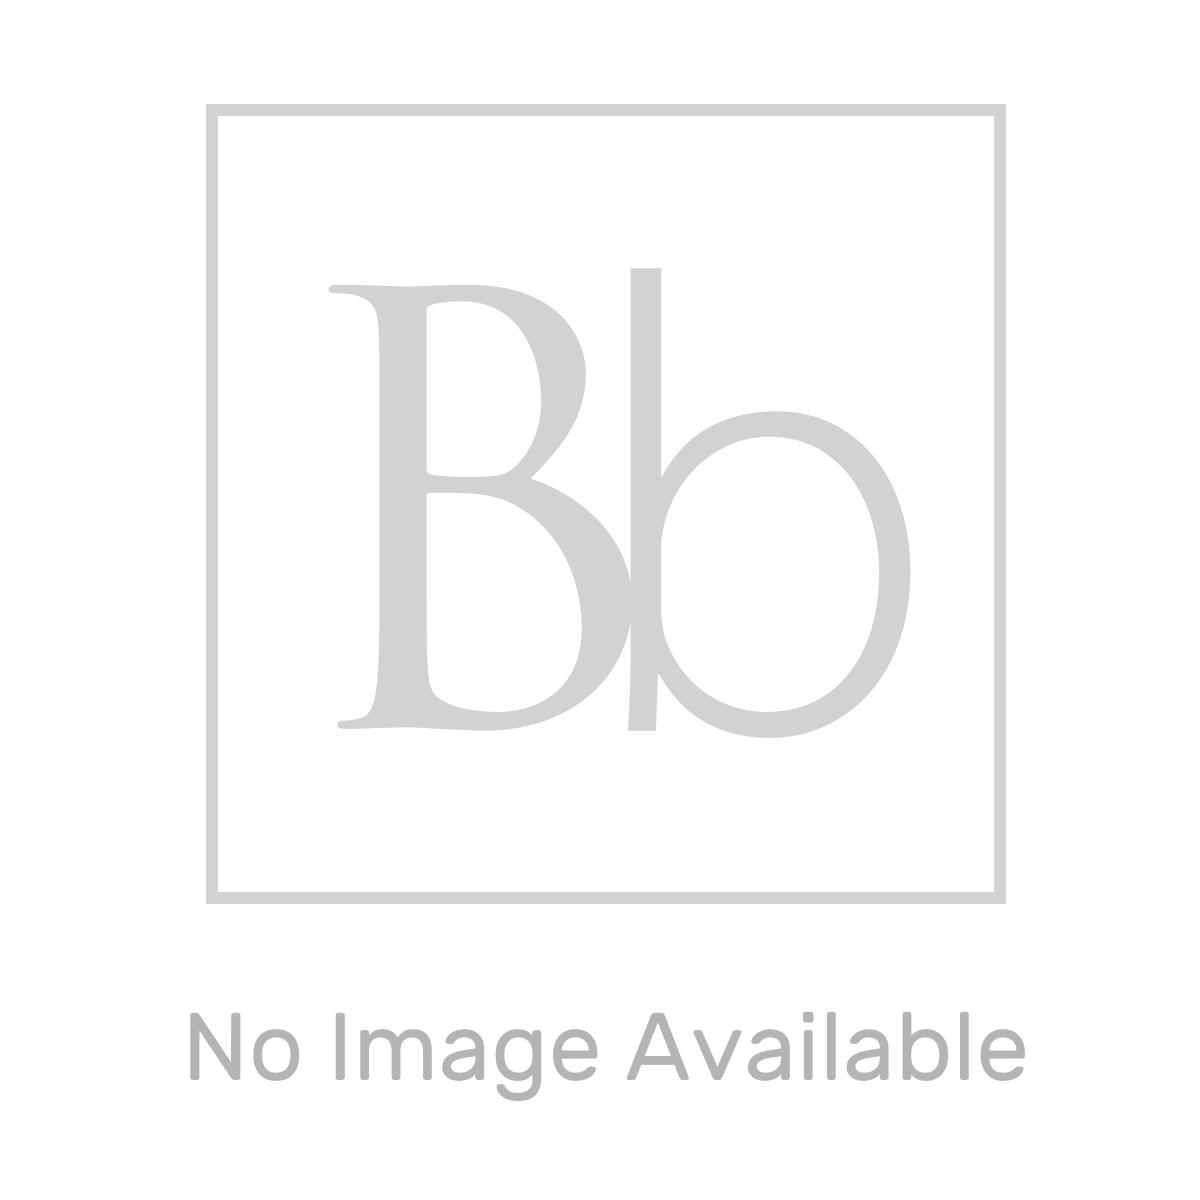 Aquadart White Slate Shower Tray 1700 x 900 Lifestyle